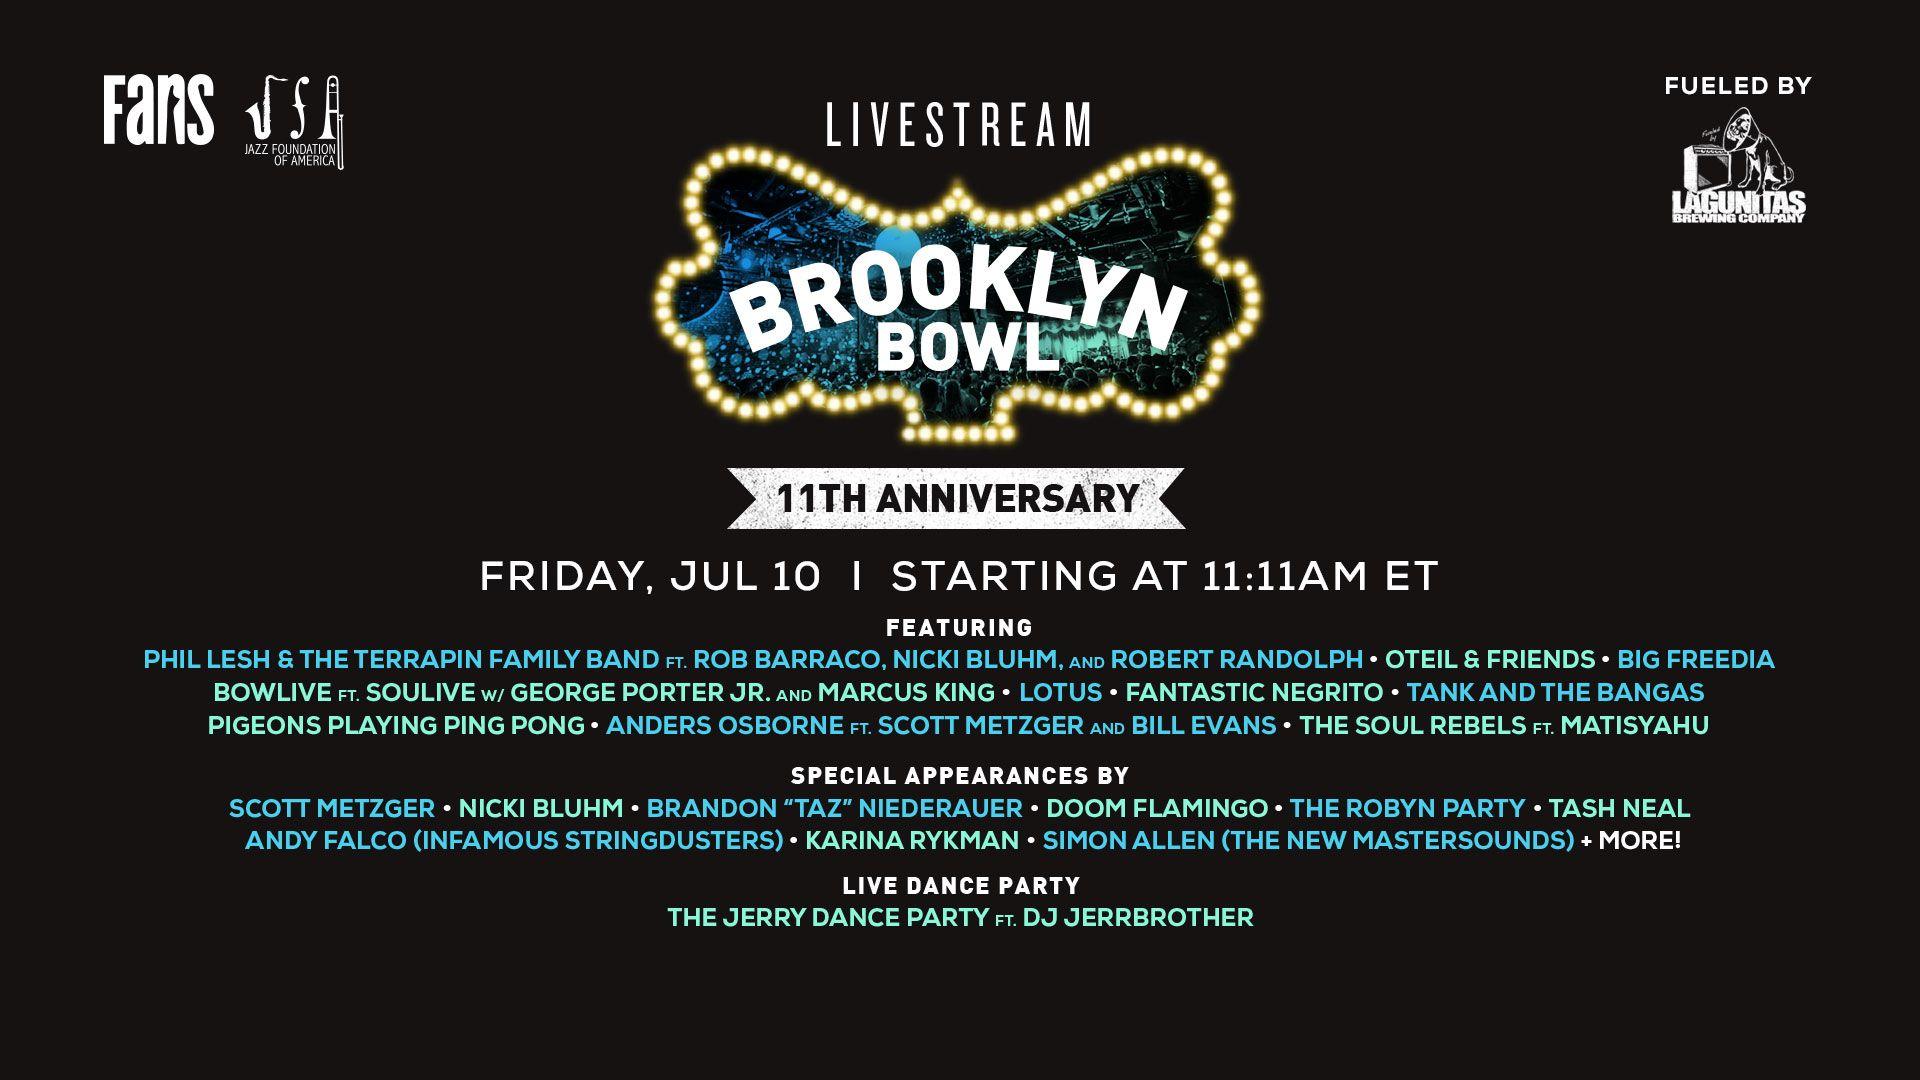 20200710_brooklynBowl_lineup_slide_1920x1080